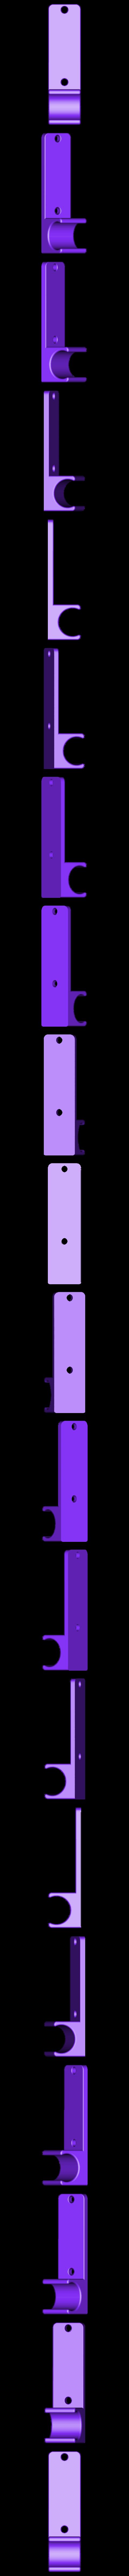 Stab Clip Single.stl Download STL file Archery Stabilizer bar Clip  • 3D printer object, daztoni